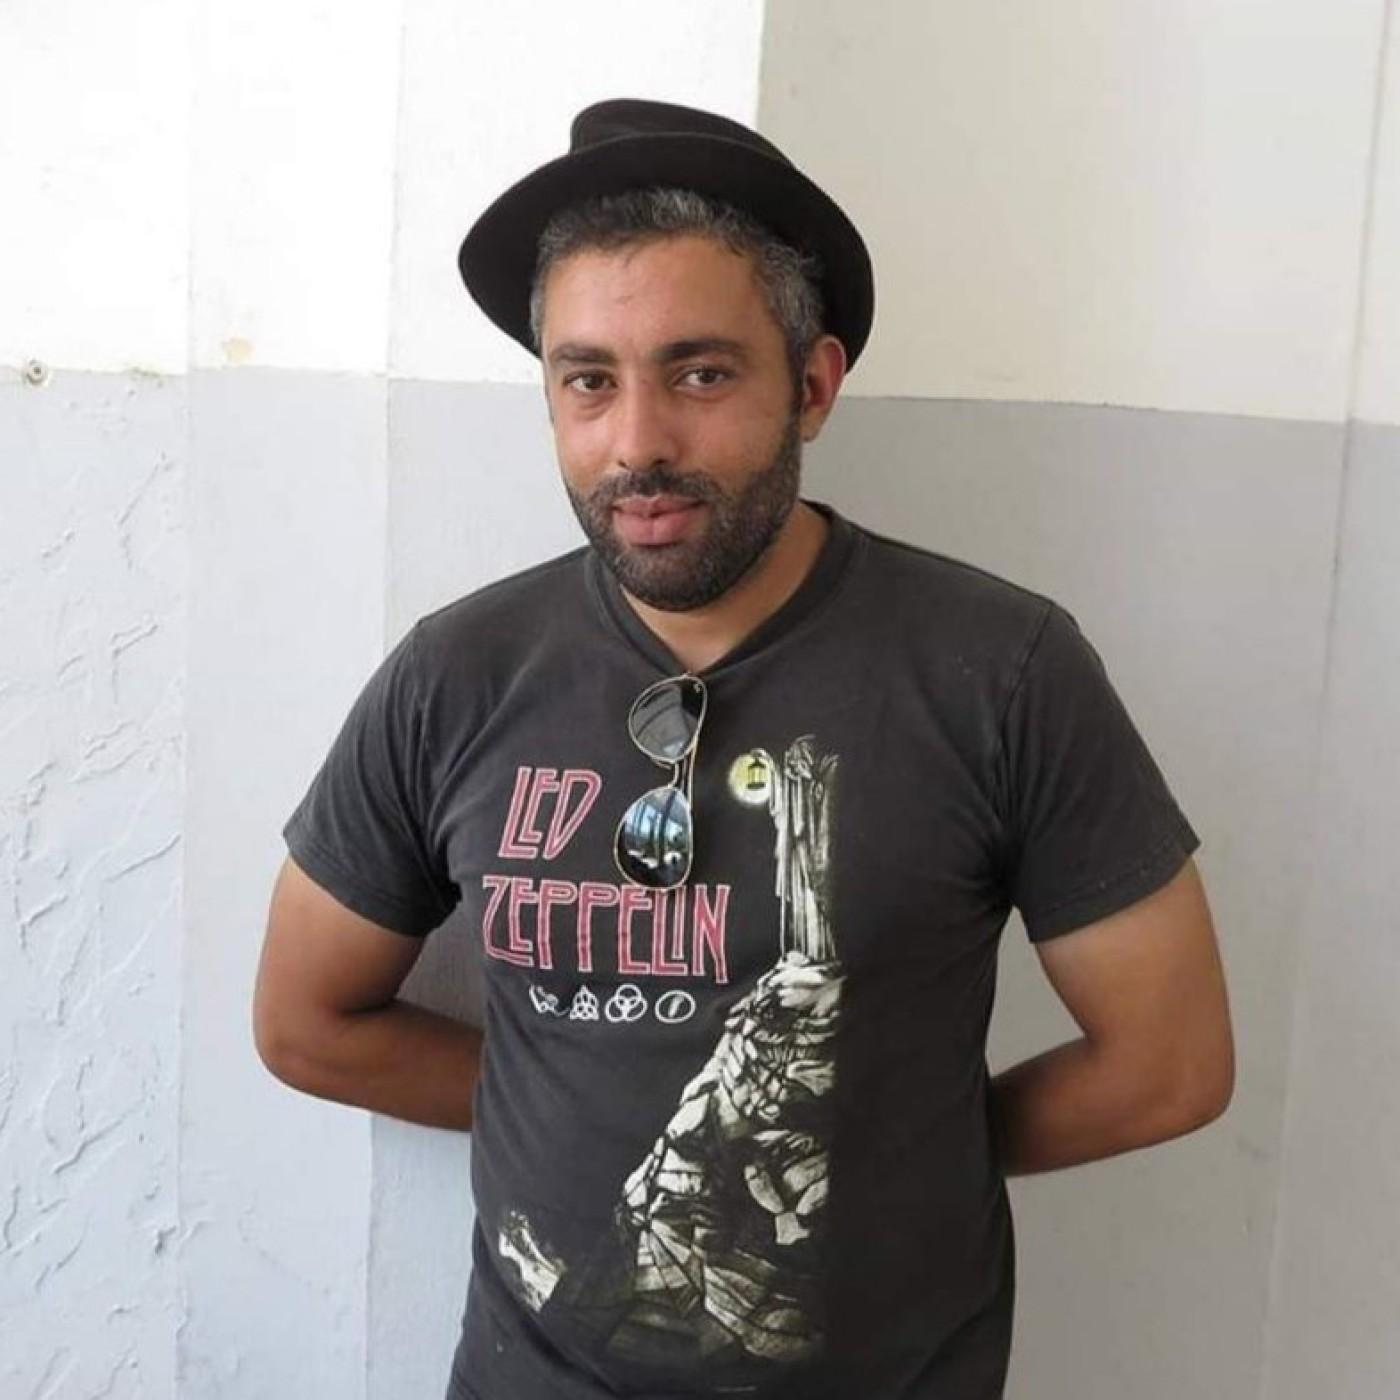 213Rock Podcast Boudjrock Algerian Rock Albums 04 08 2020